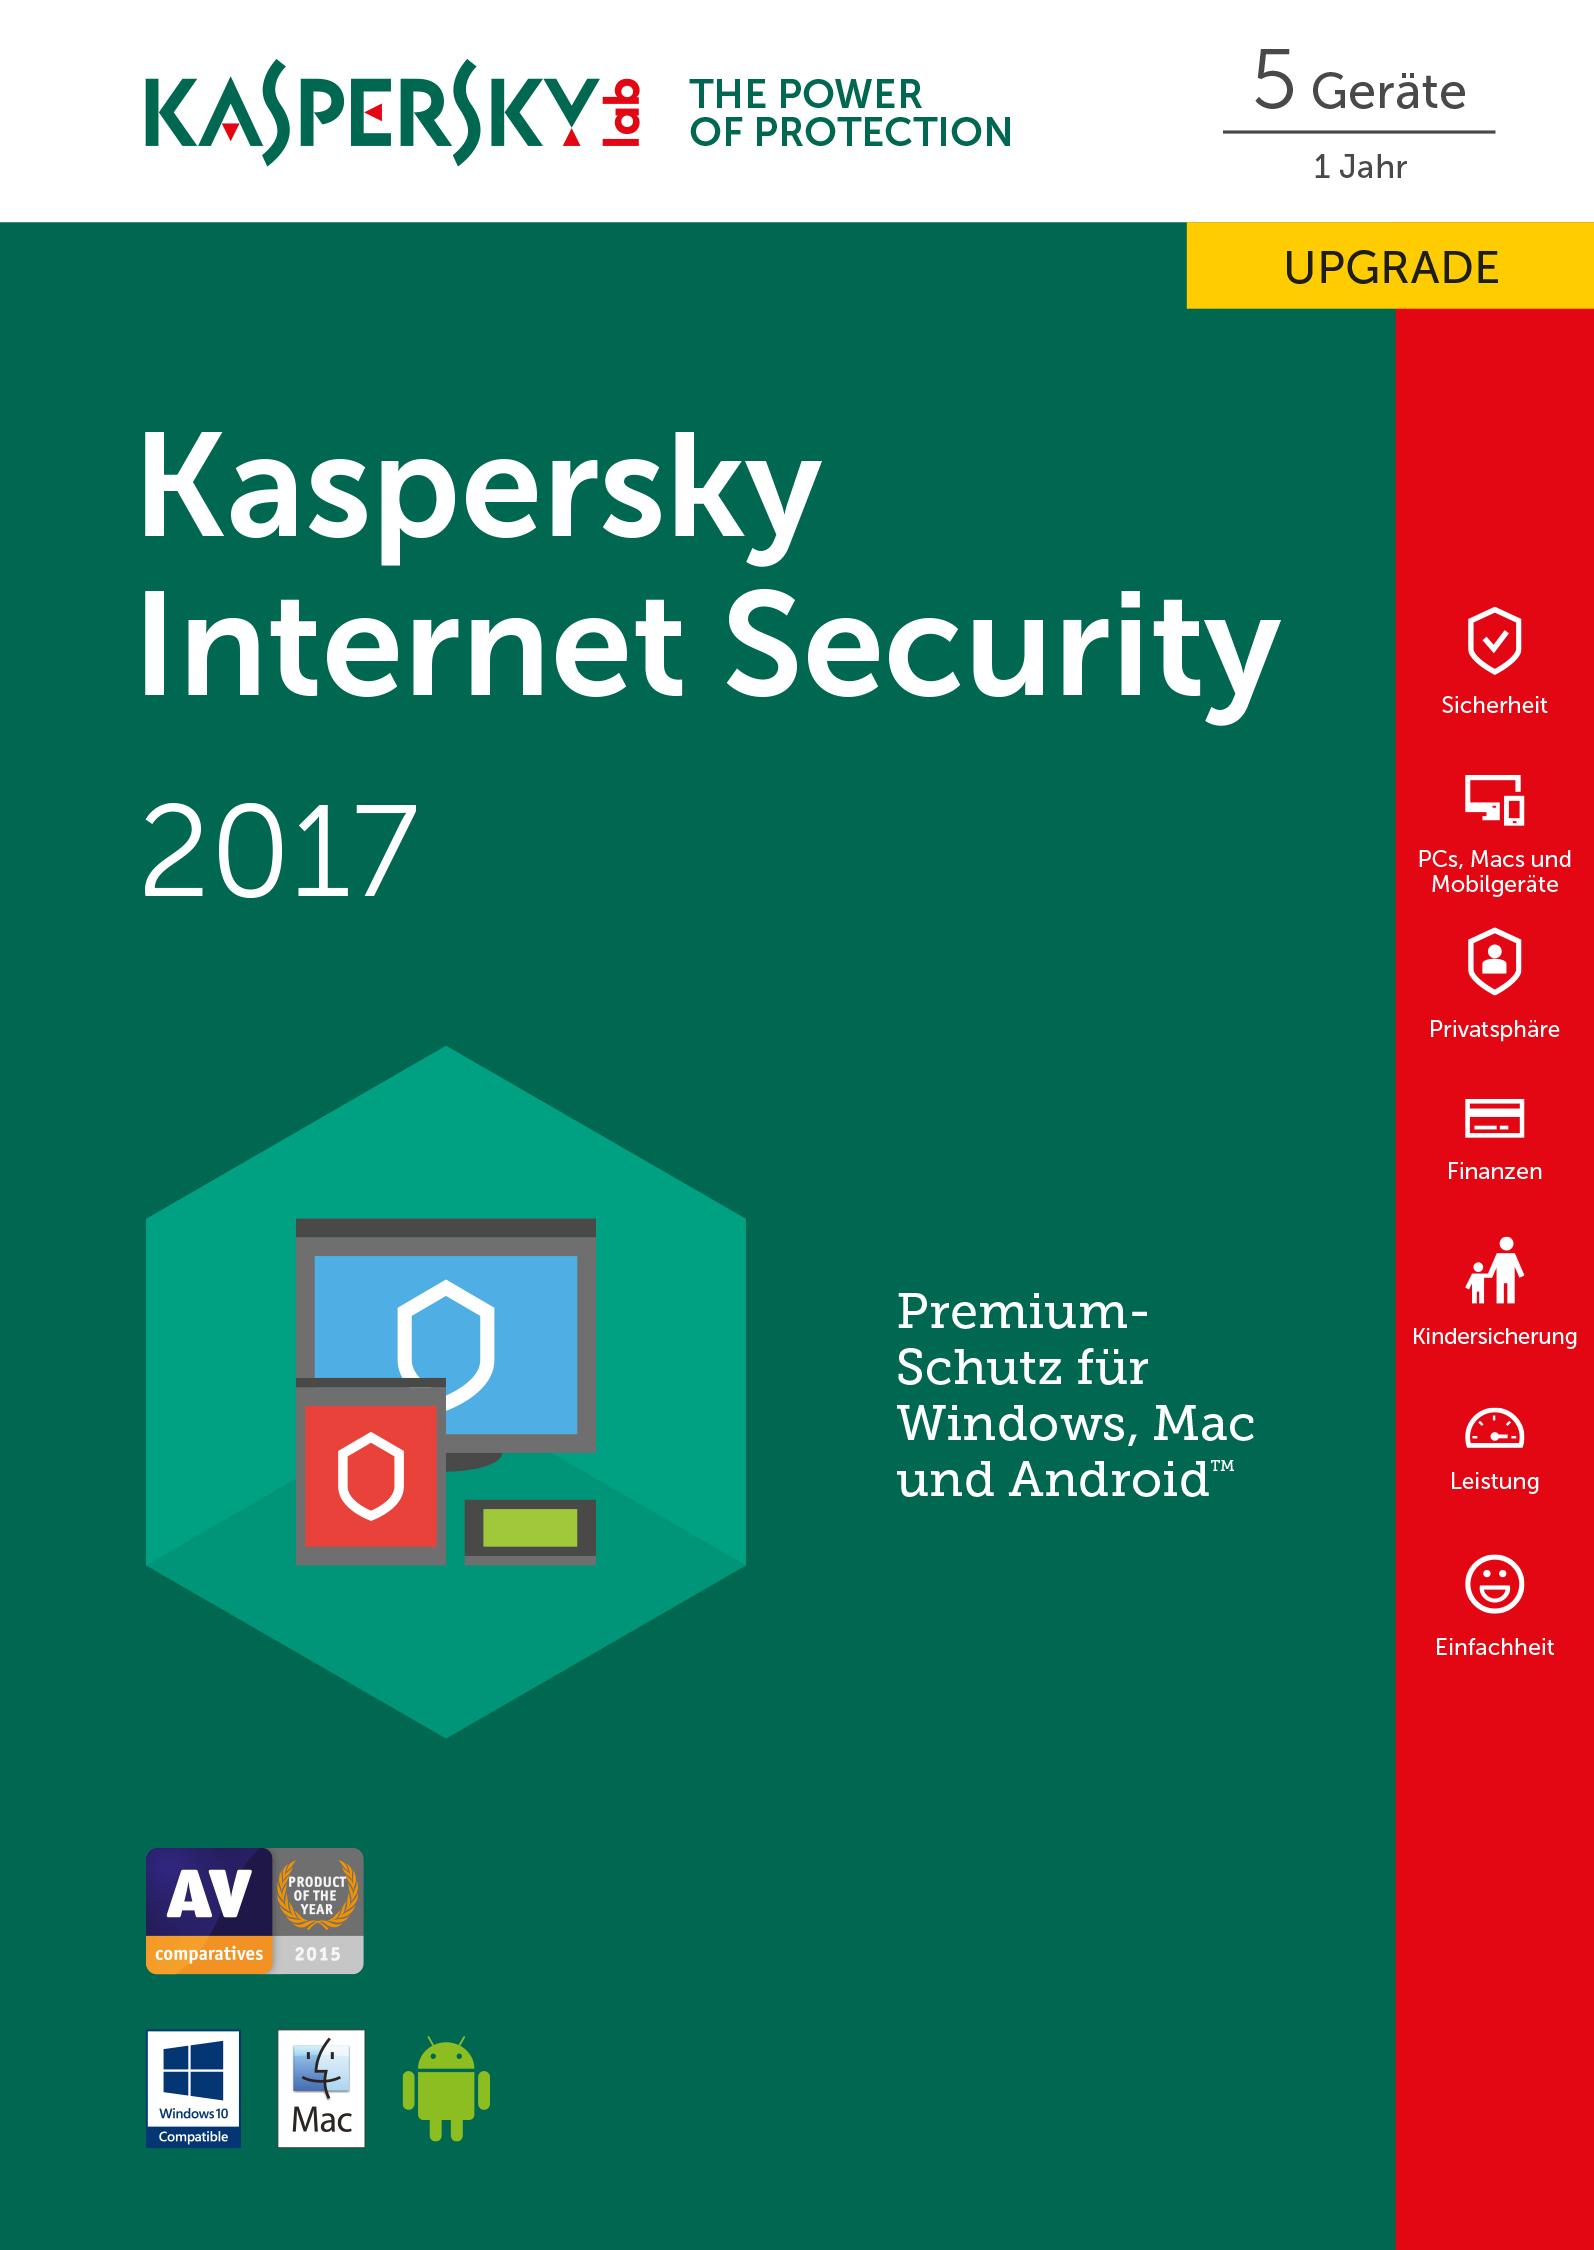 Kaspersky Internet Security 2017 - Box-Pack (Upgrade) ( 1 Jahr ) - 5 Peripheriegeräte ( Sierra )